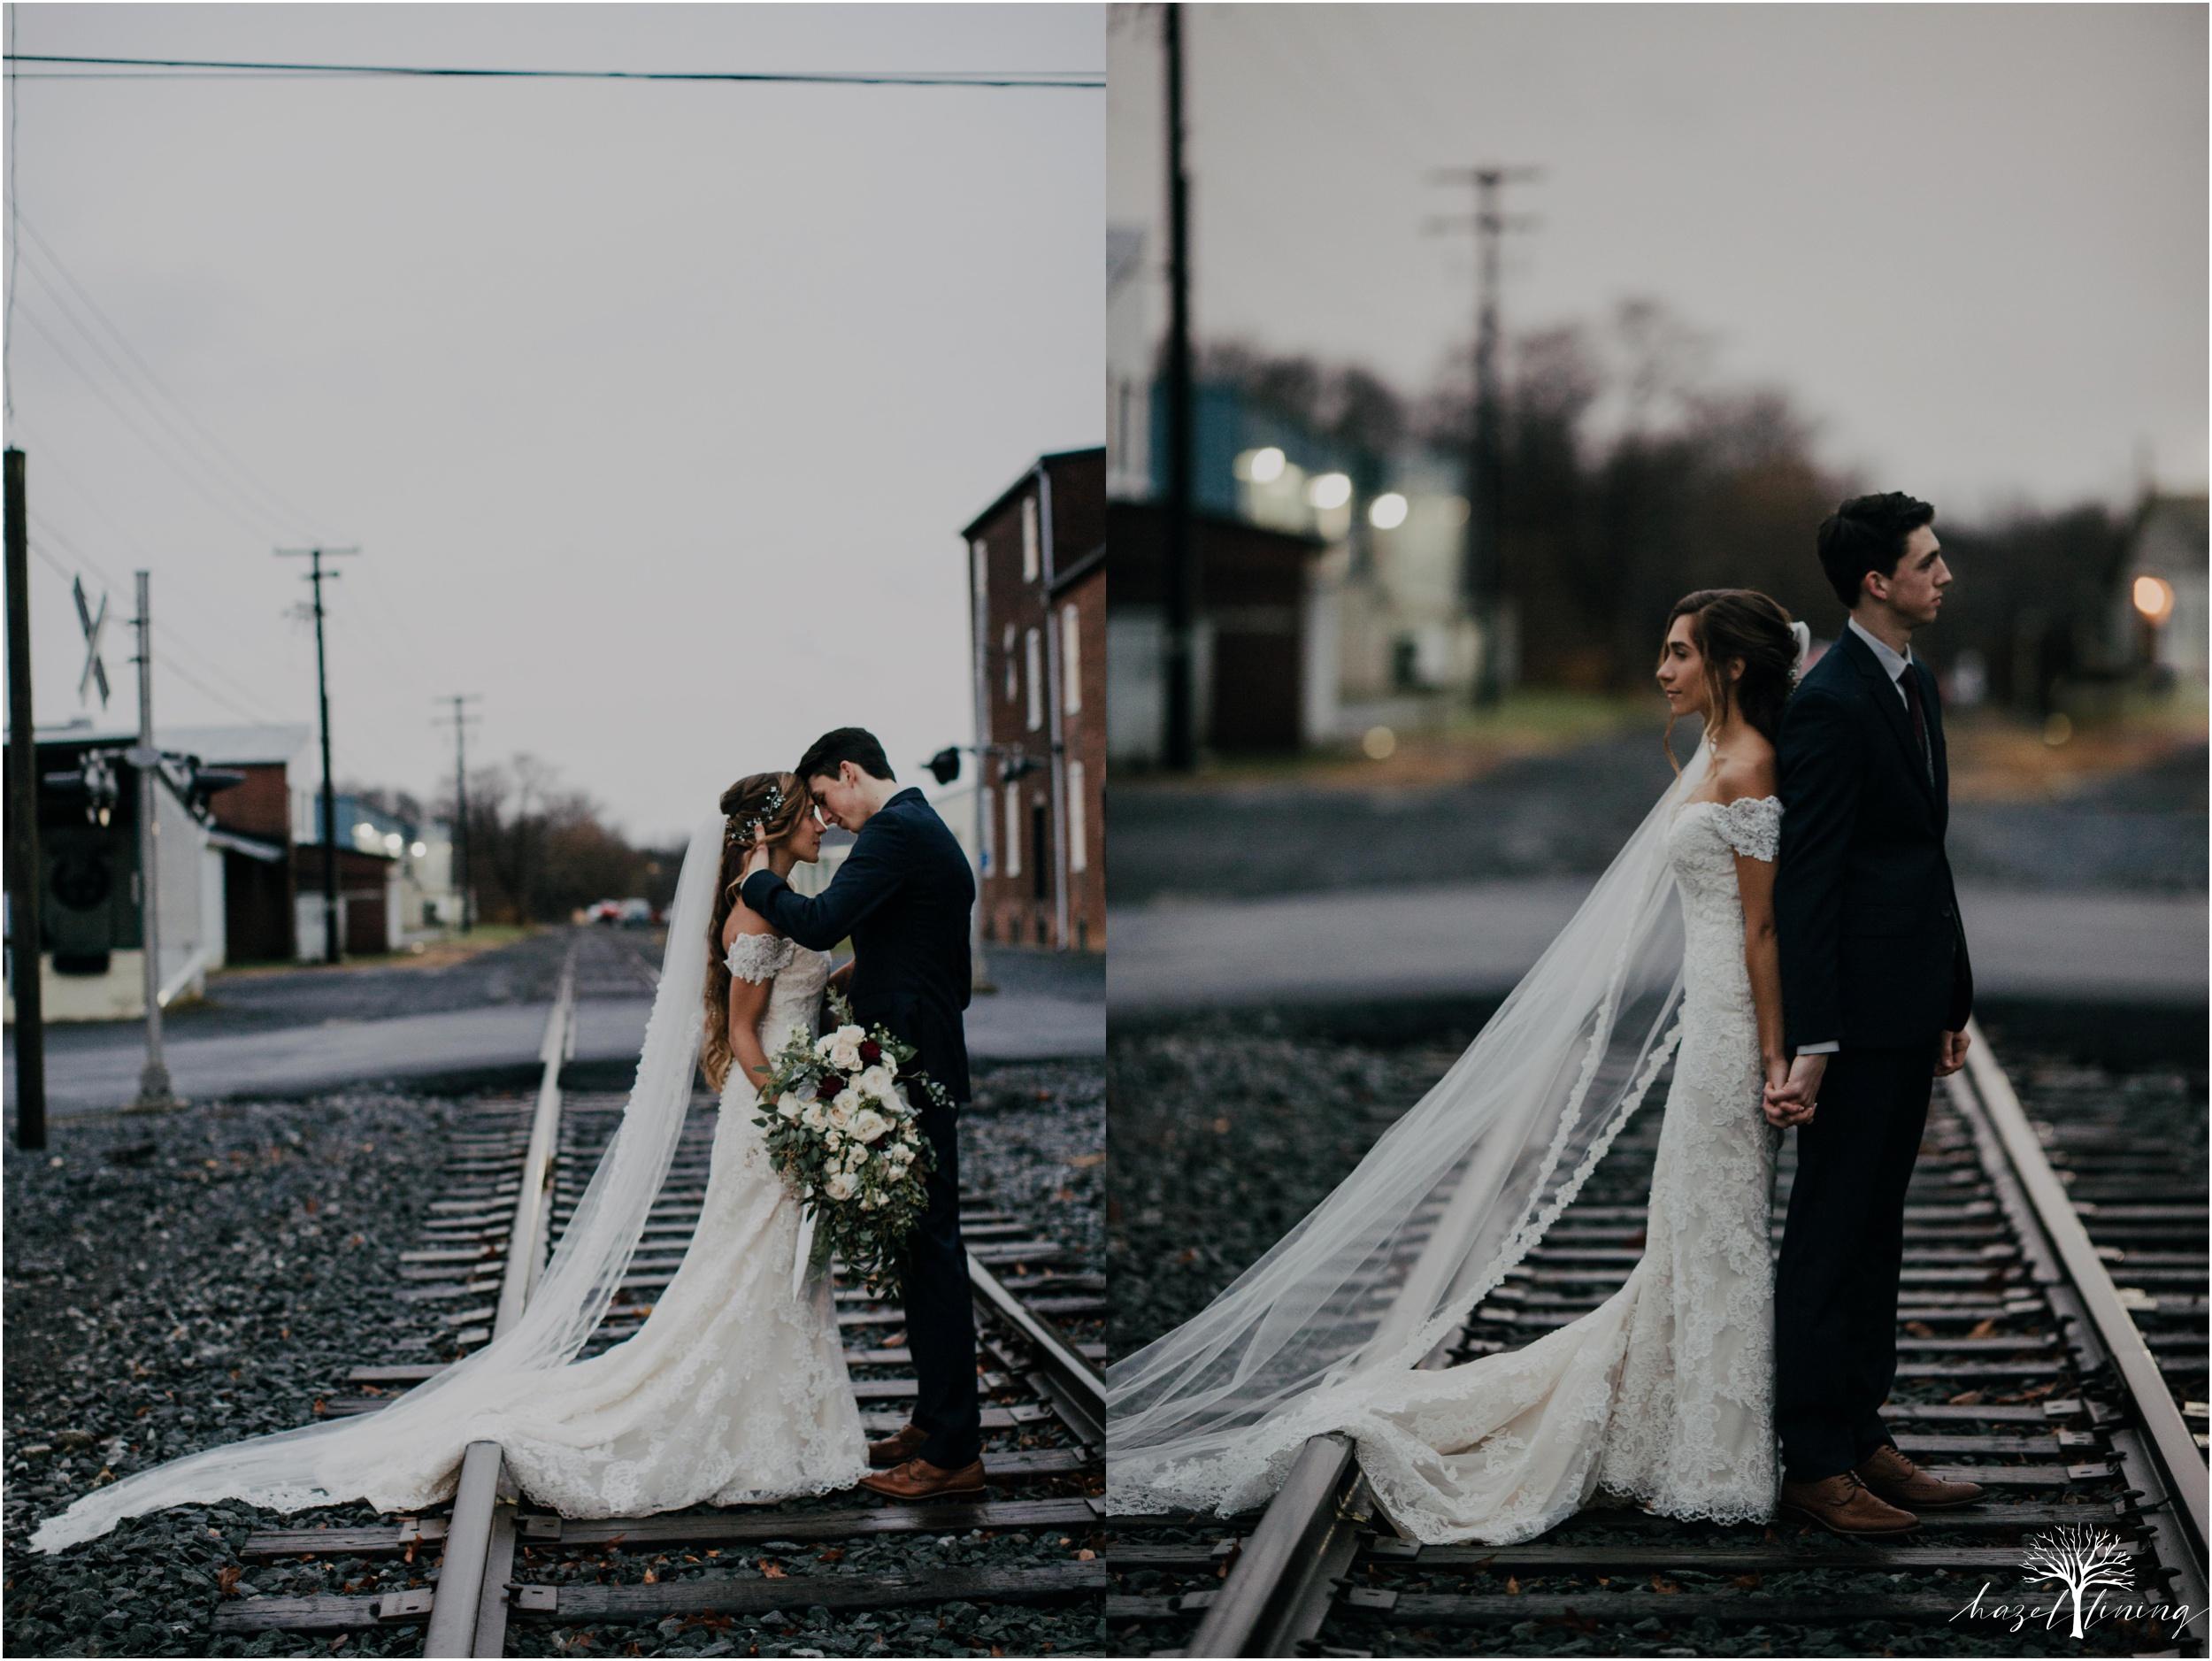 emma-matt-gehringer-the-booking-house-lancaster-manhiem-pennsylvania-winter-wedding_0111.jpg